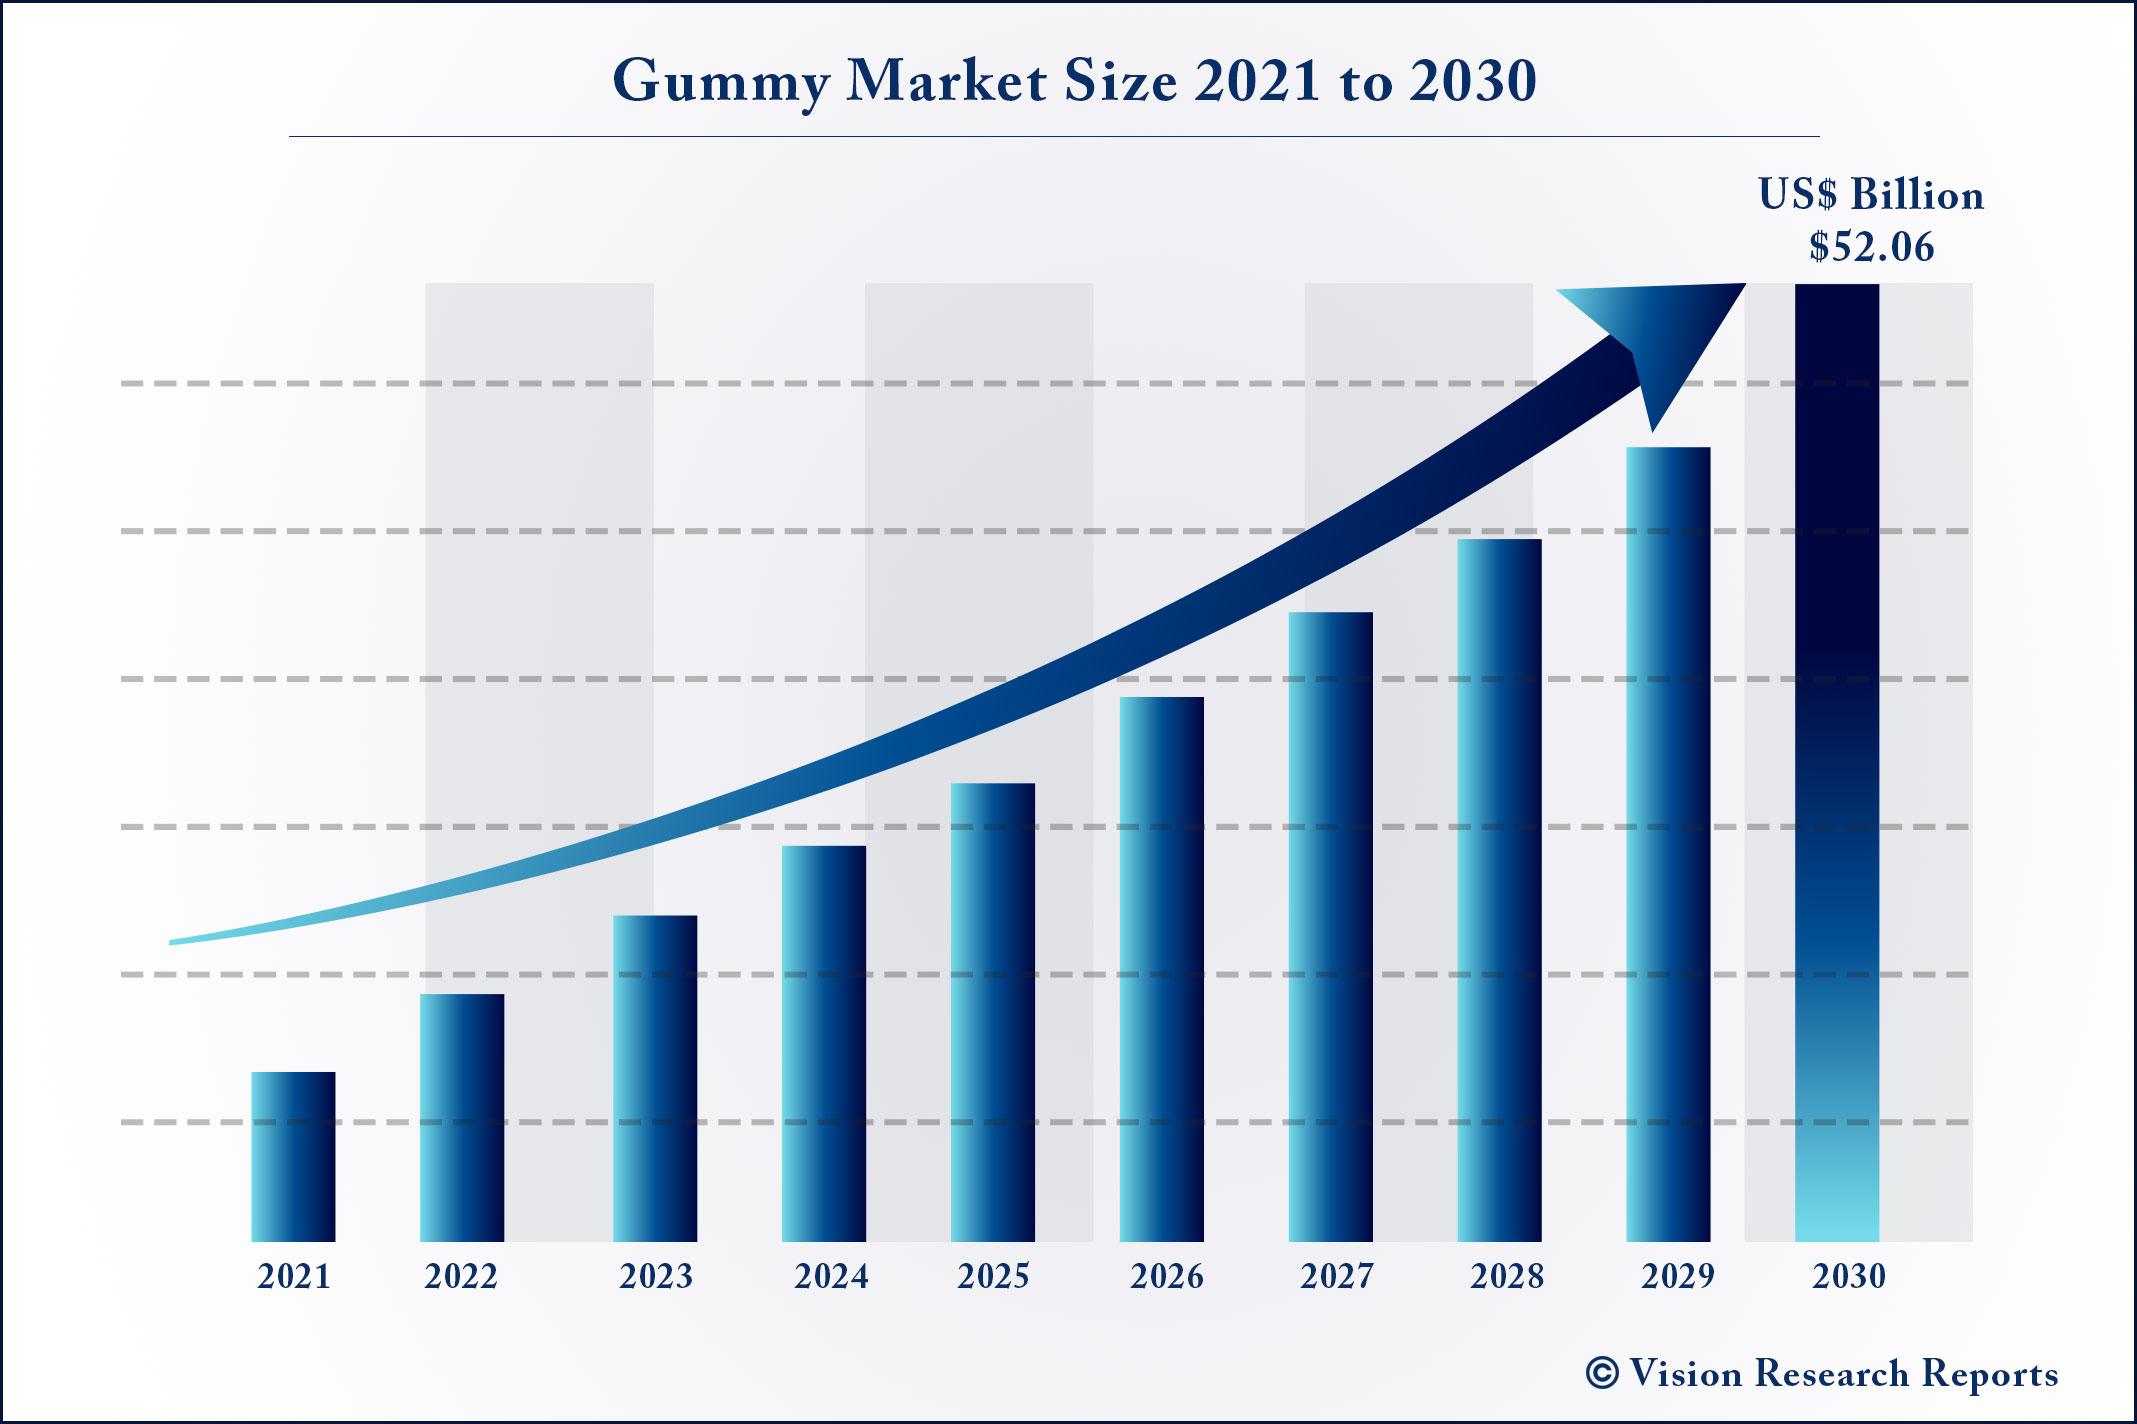 Gummy Market Size 2021 to 2030